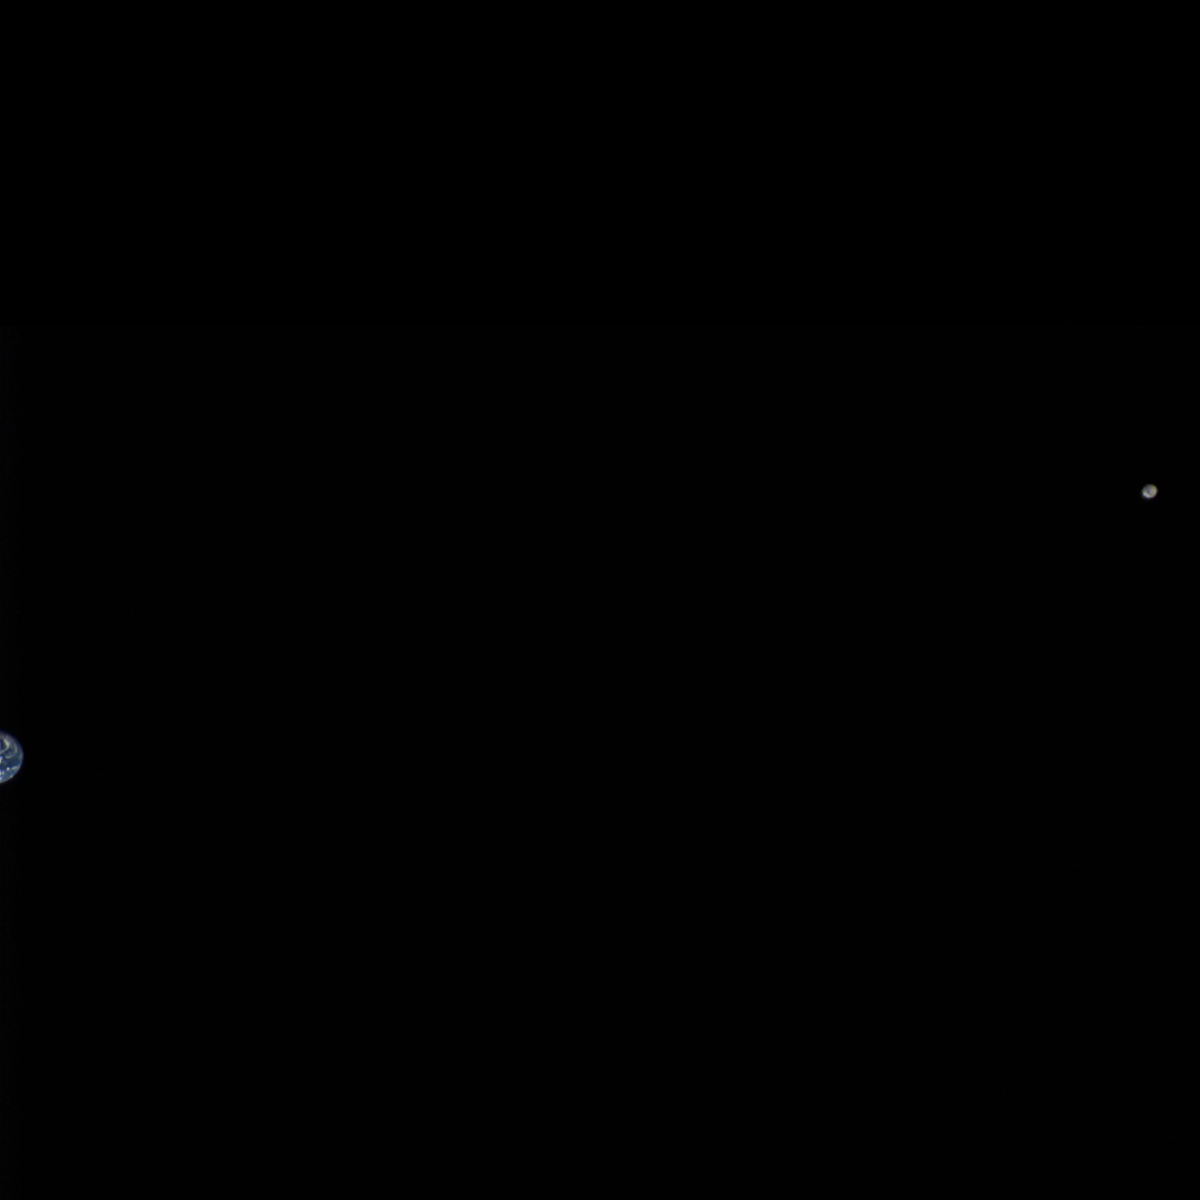 OSIRIS-REx's view of the Earth and moon from over 5 million km away. Credit: NASA/Goddard/University of Arizona